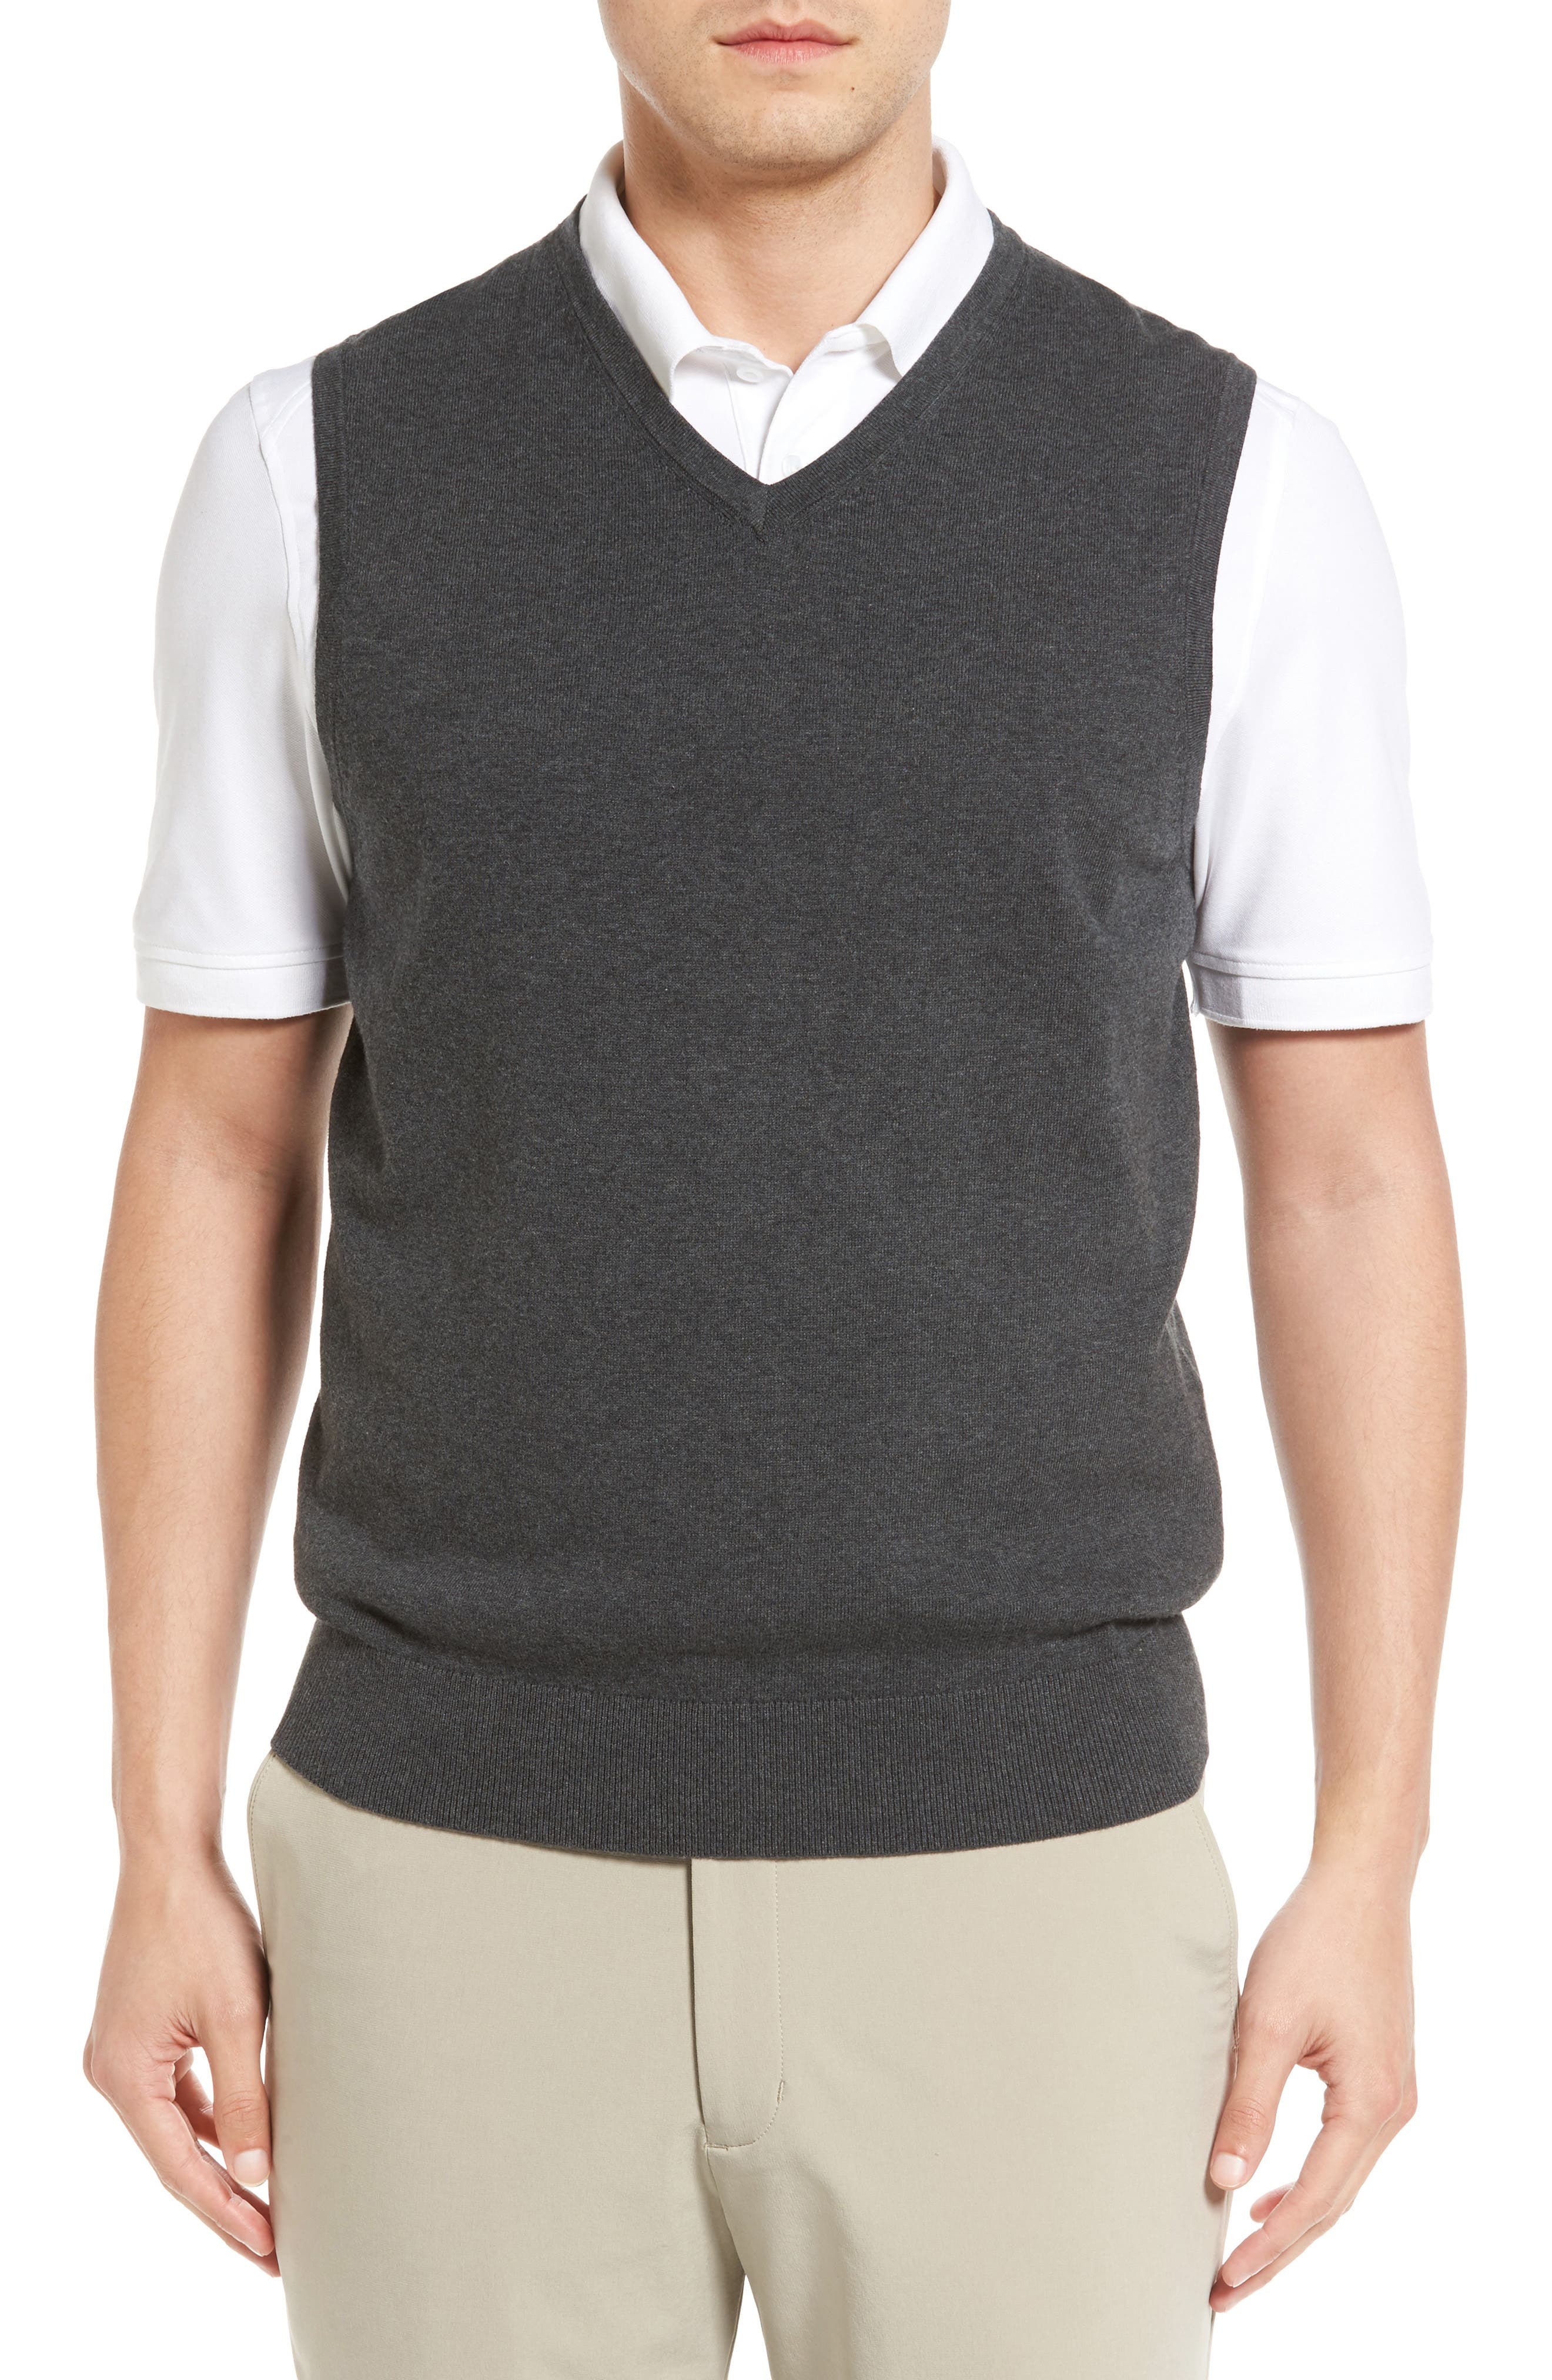 Lakemont V-Neck Sweater Vest, Main, color, CHARCOAL HEATHER